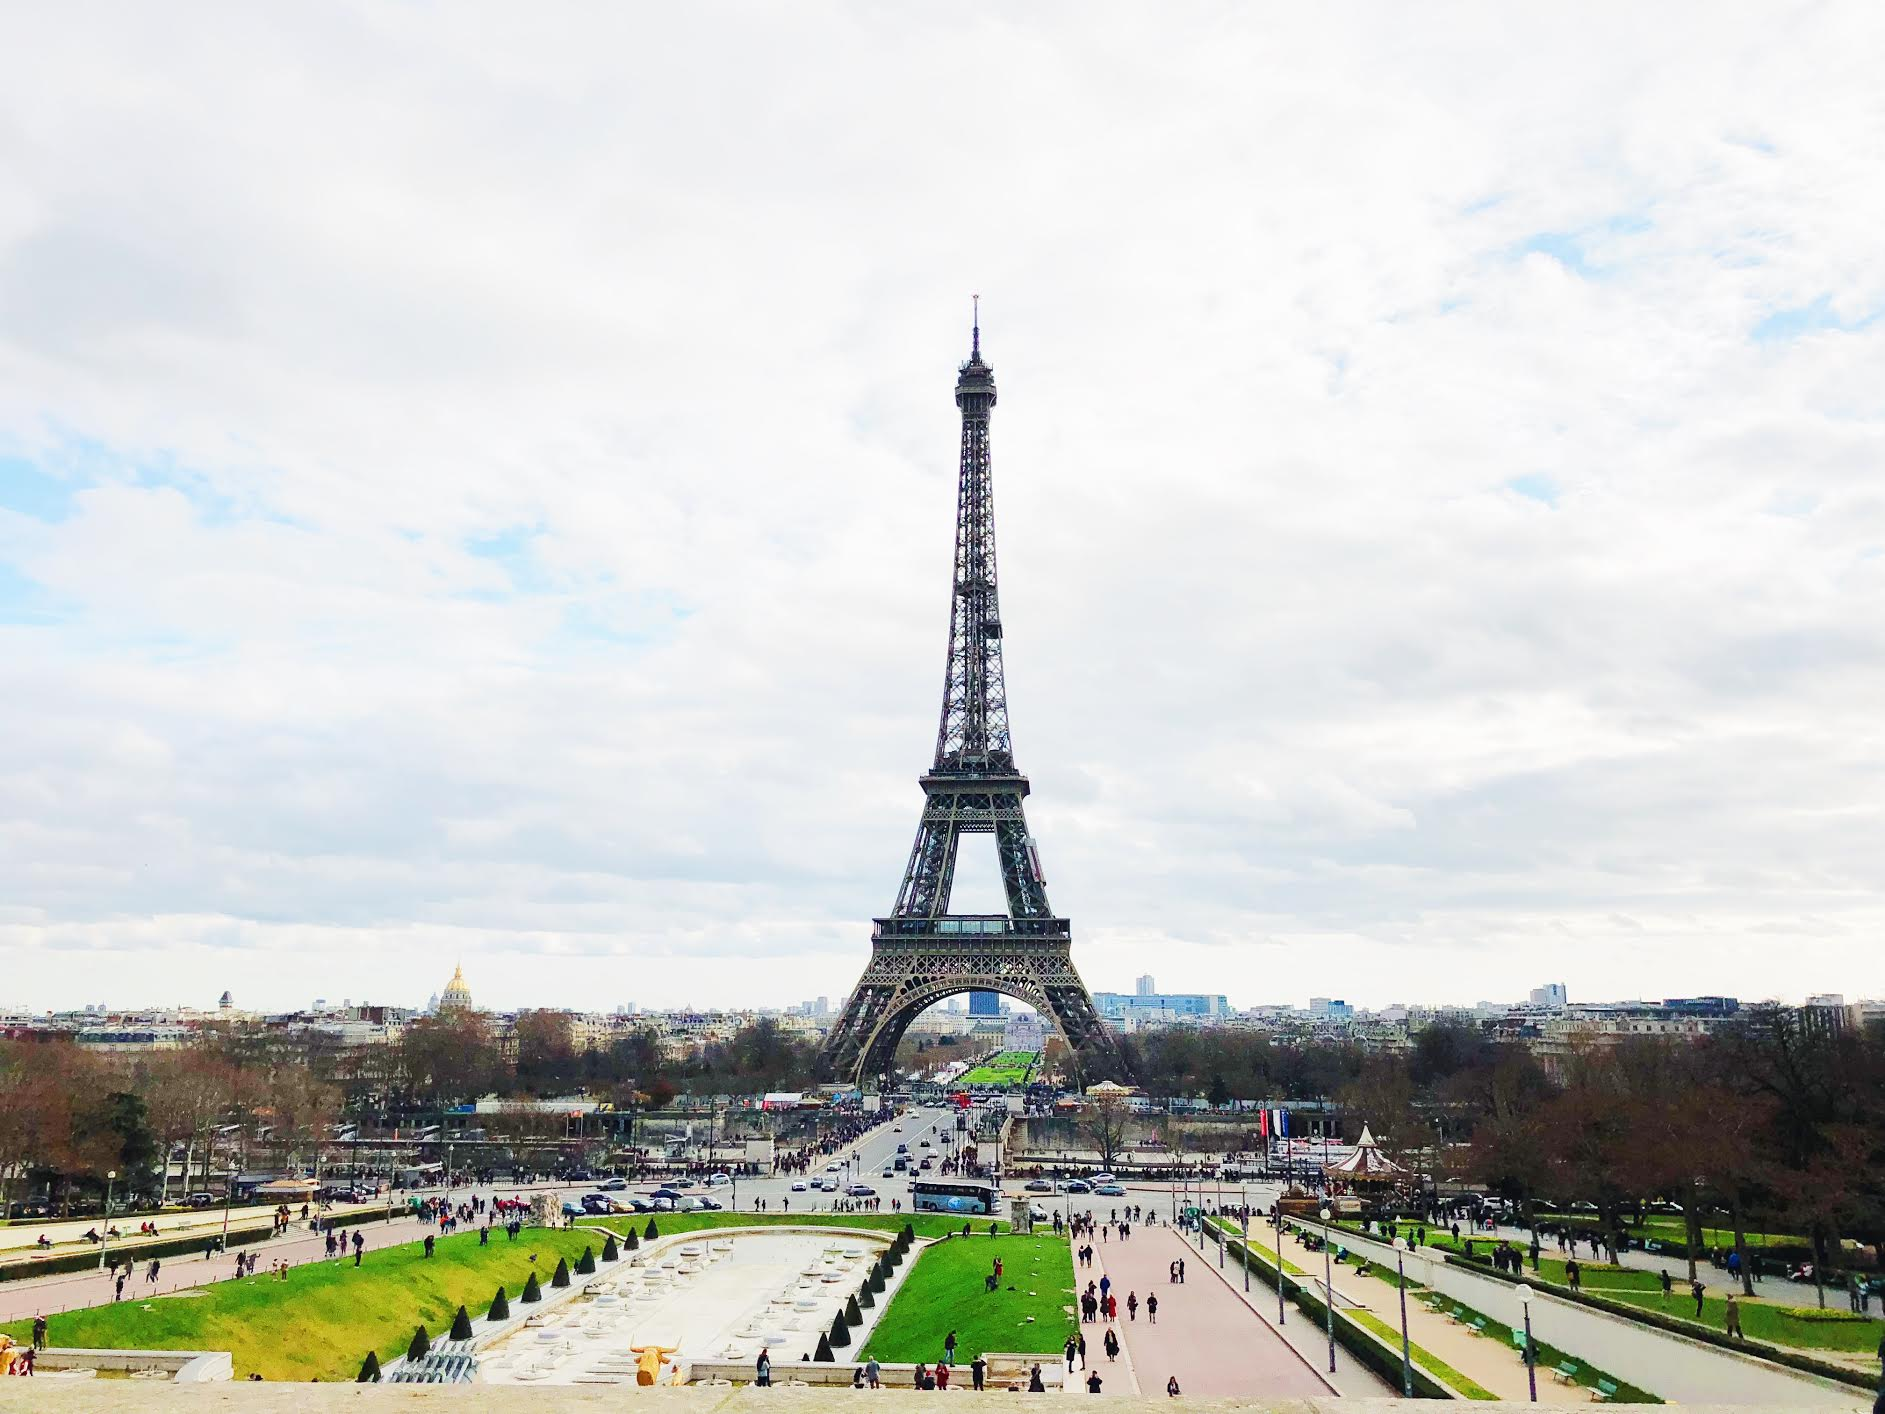 Muslim-travel-guide-Paris-Eiffel-Tower-garden-view.jpg